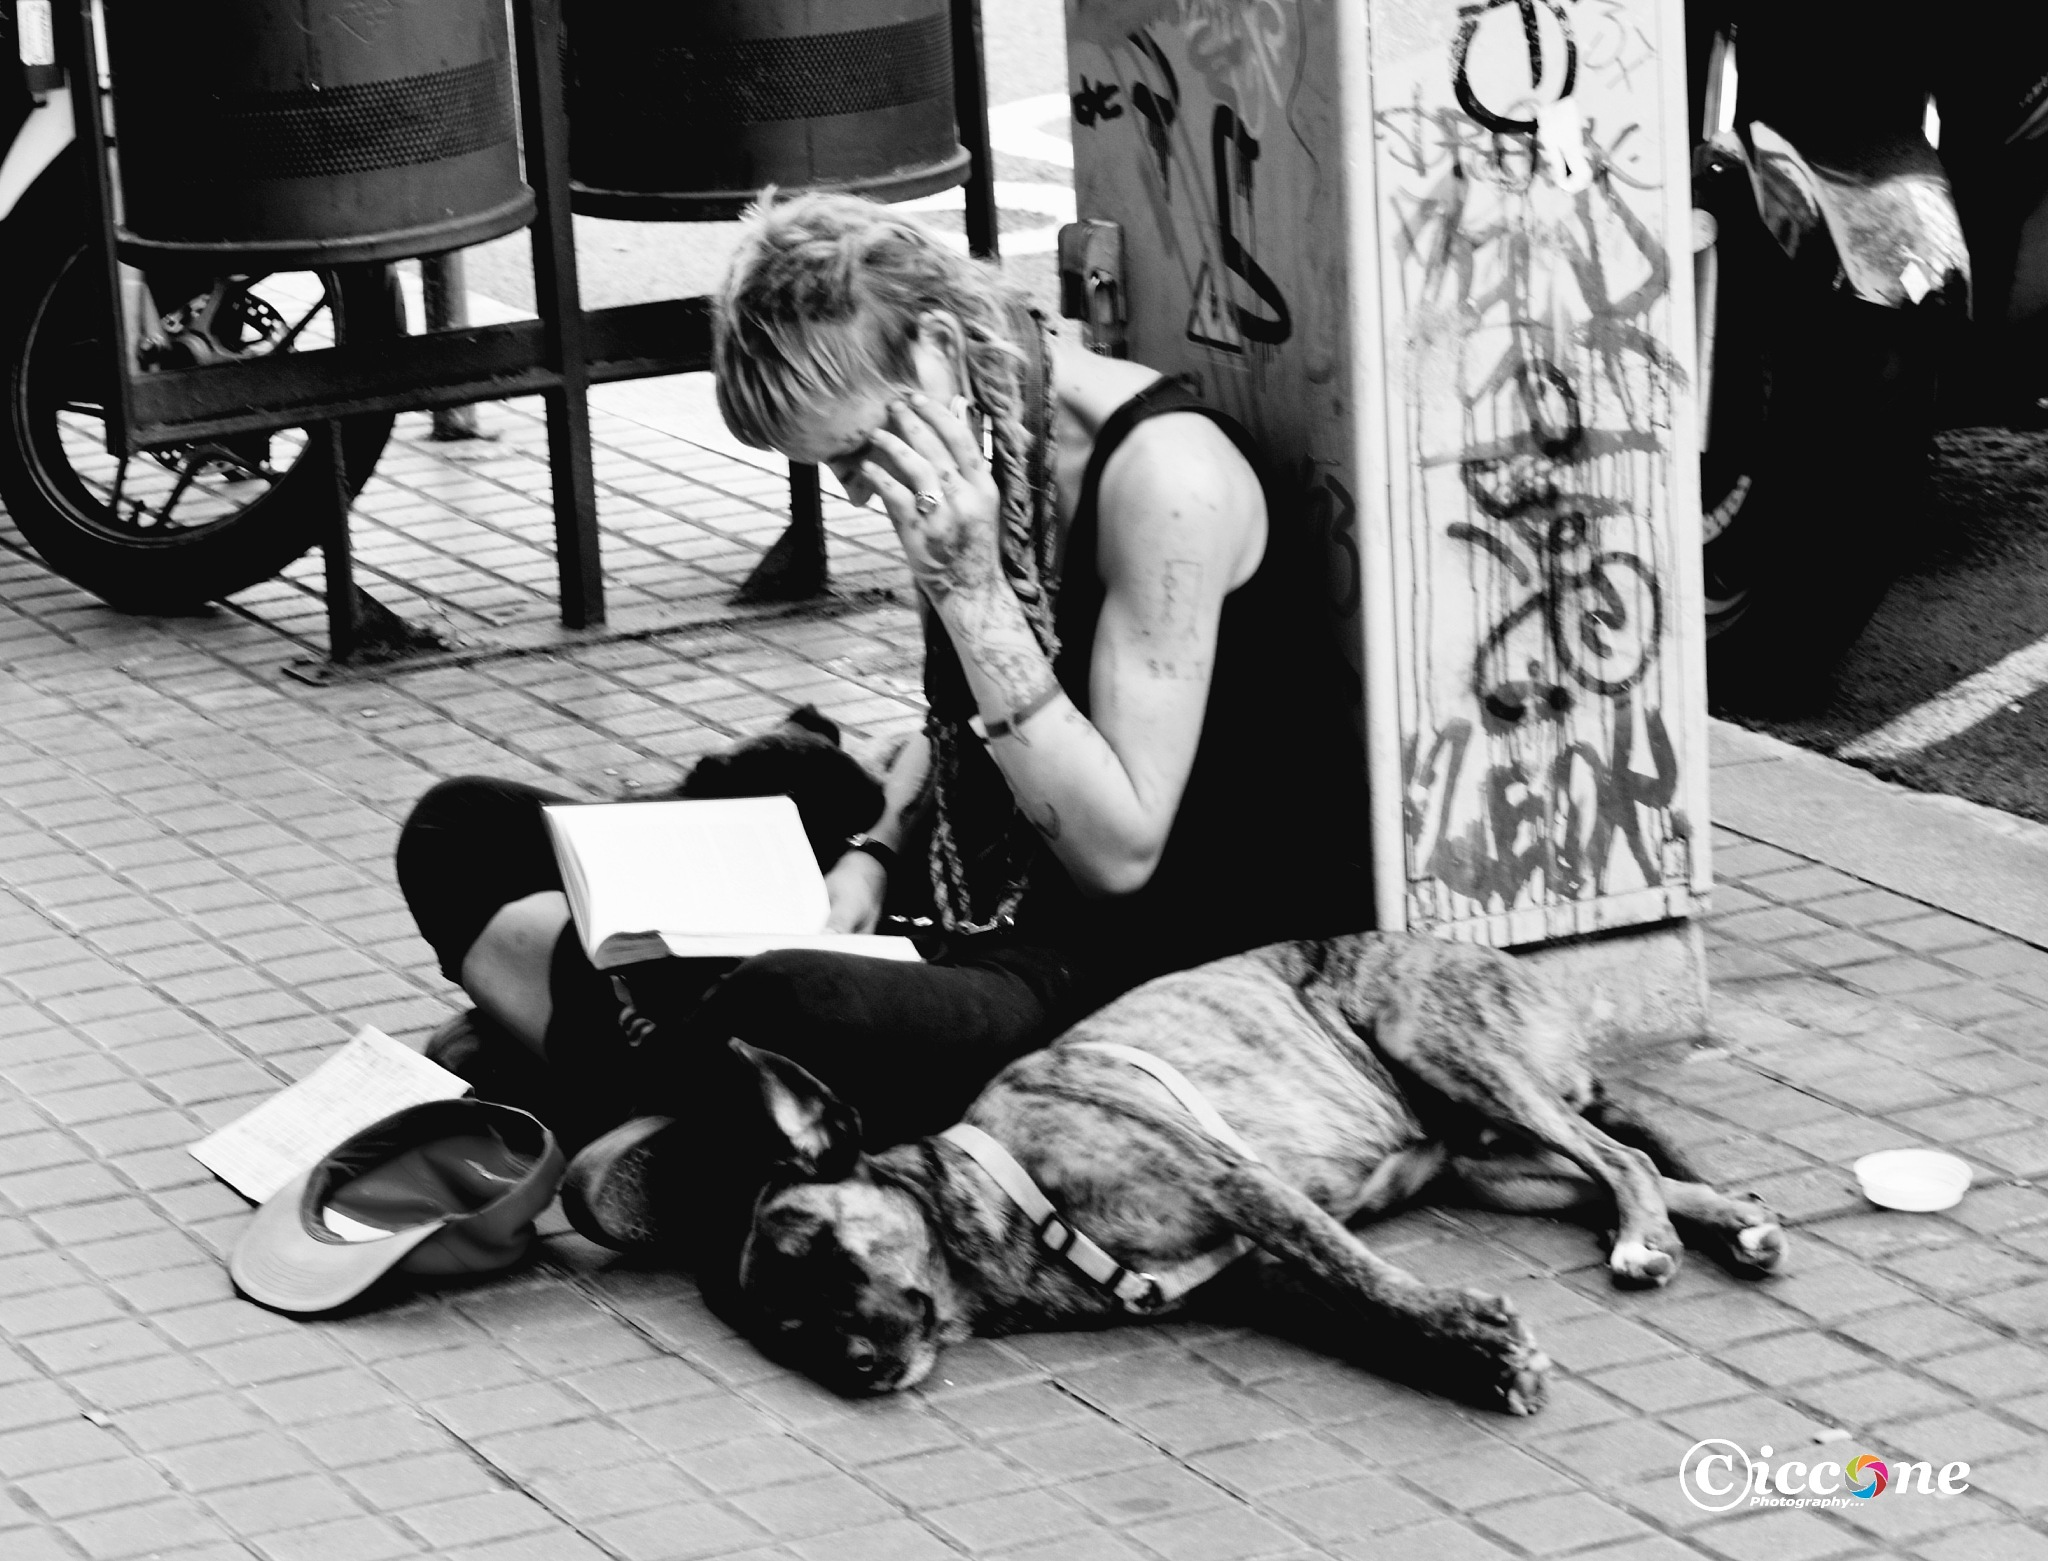 Street Beggar in Barcelona by Marc Ciccone